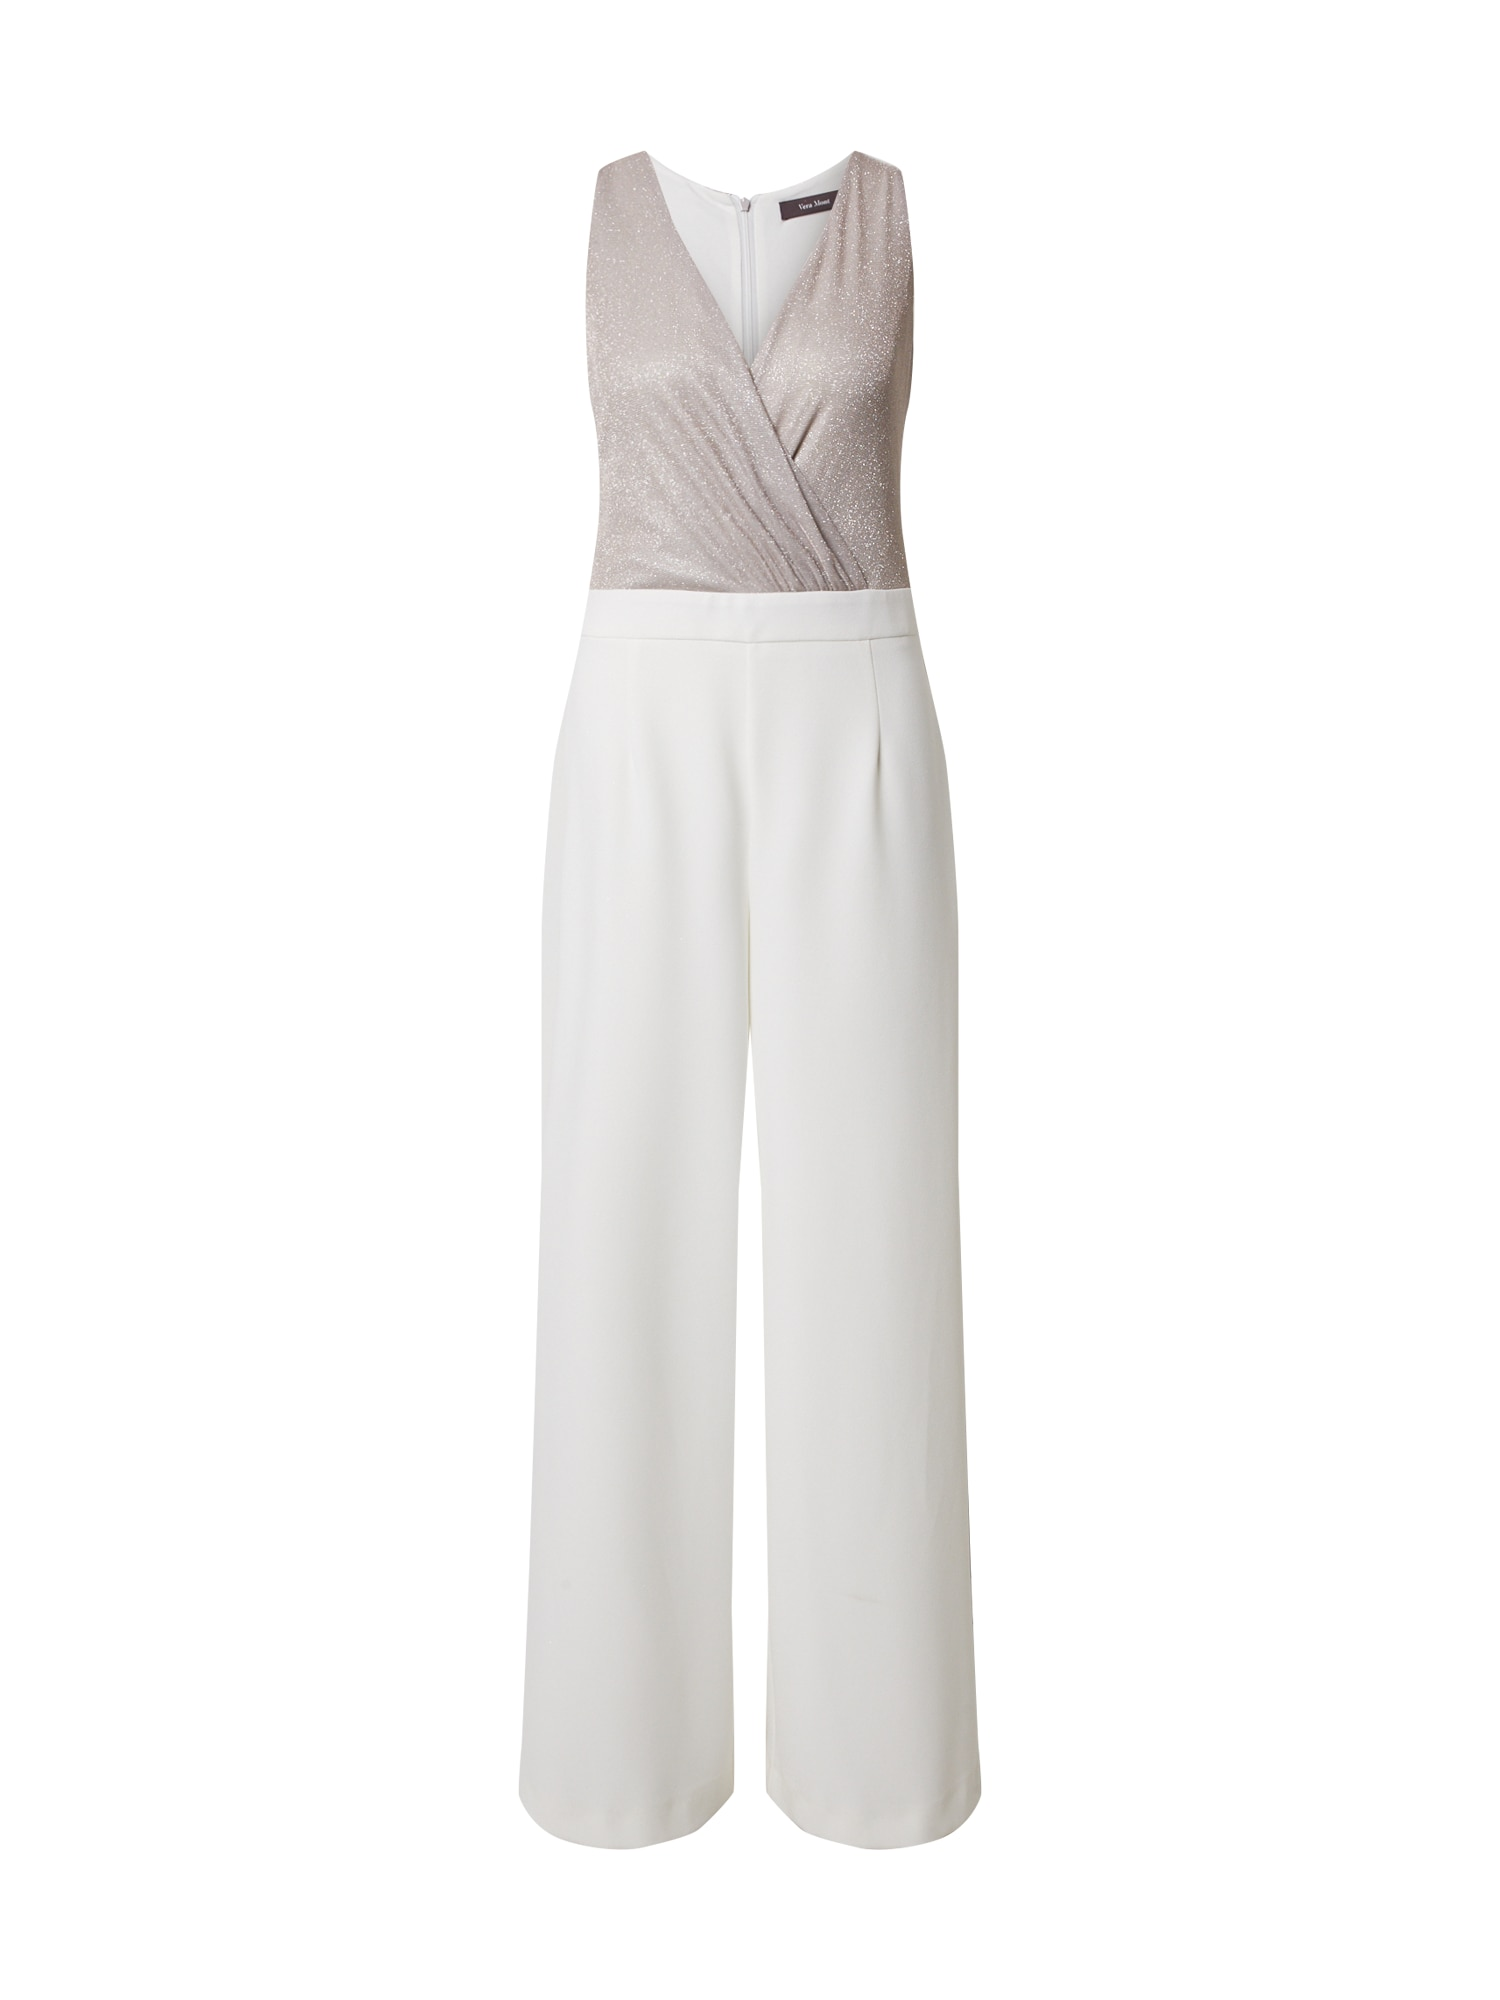 Vera Mont Vienos dalies kostiumas balta / kremo